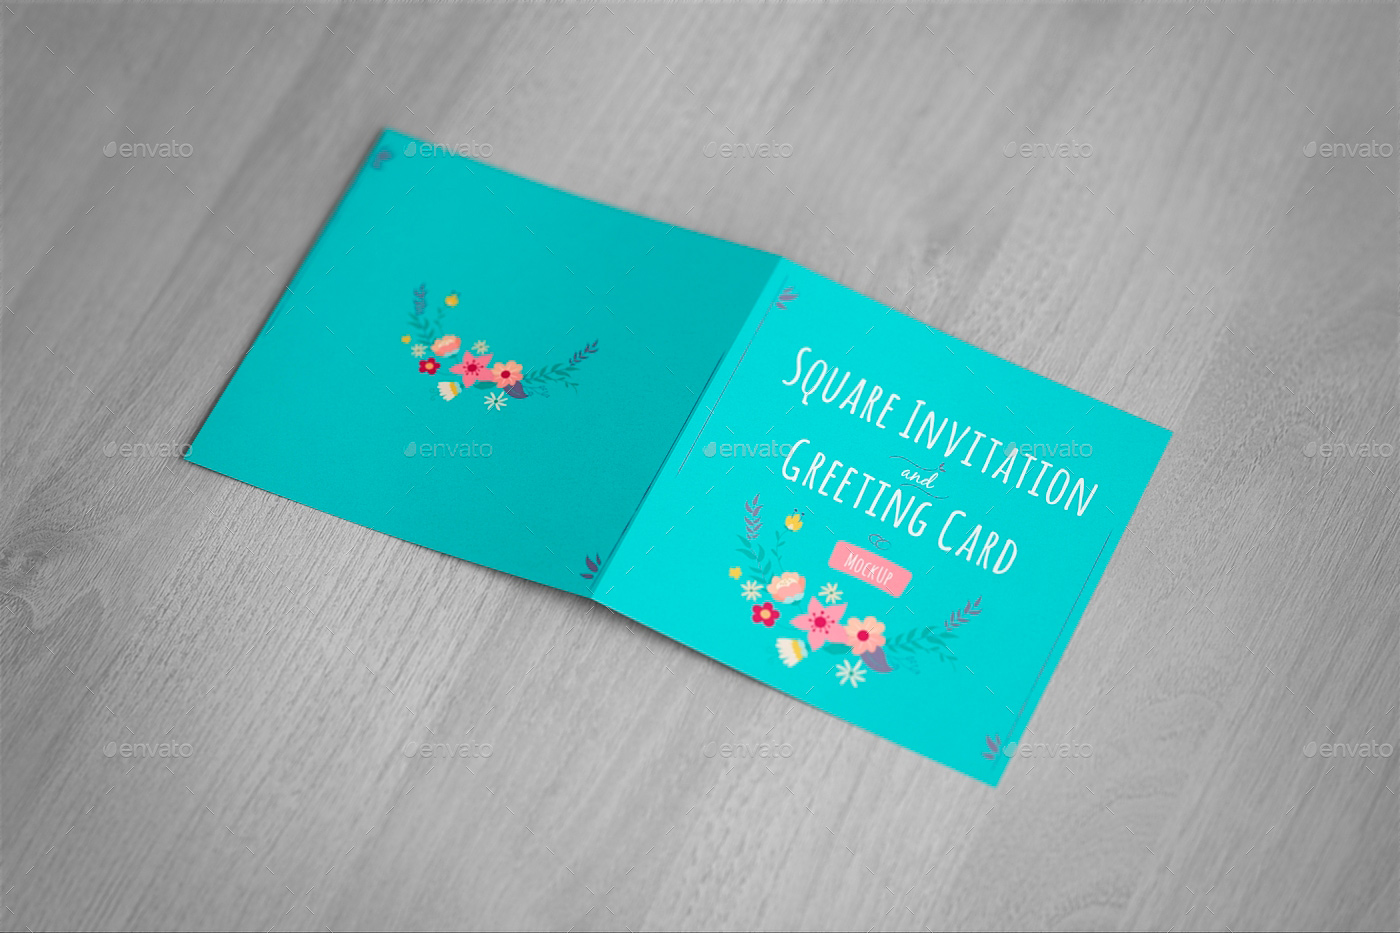 Square Invitation And Greeting Card Mockup Free Version